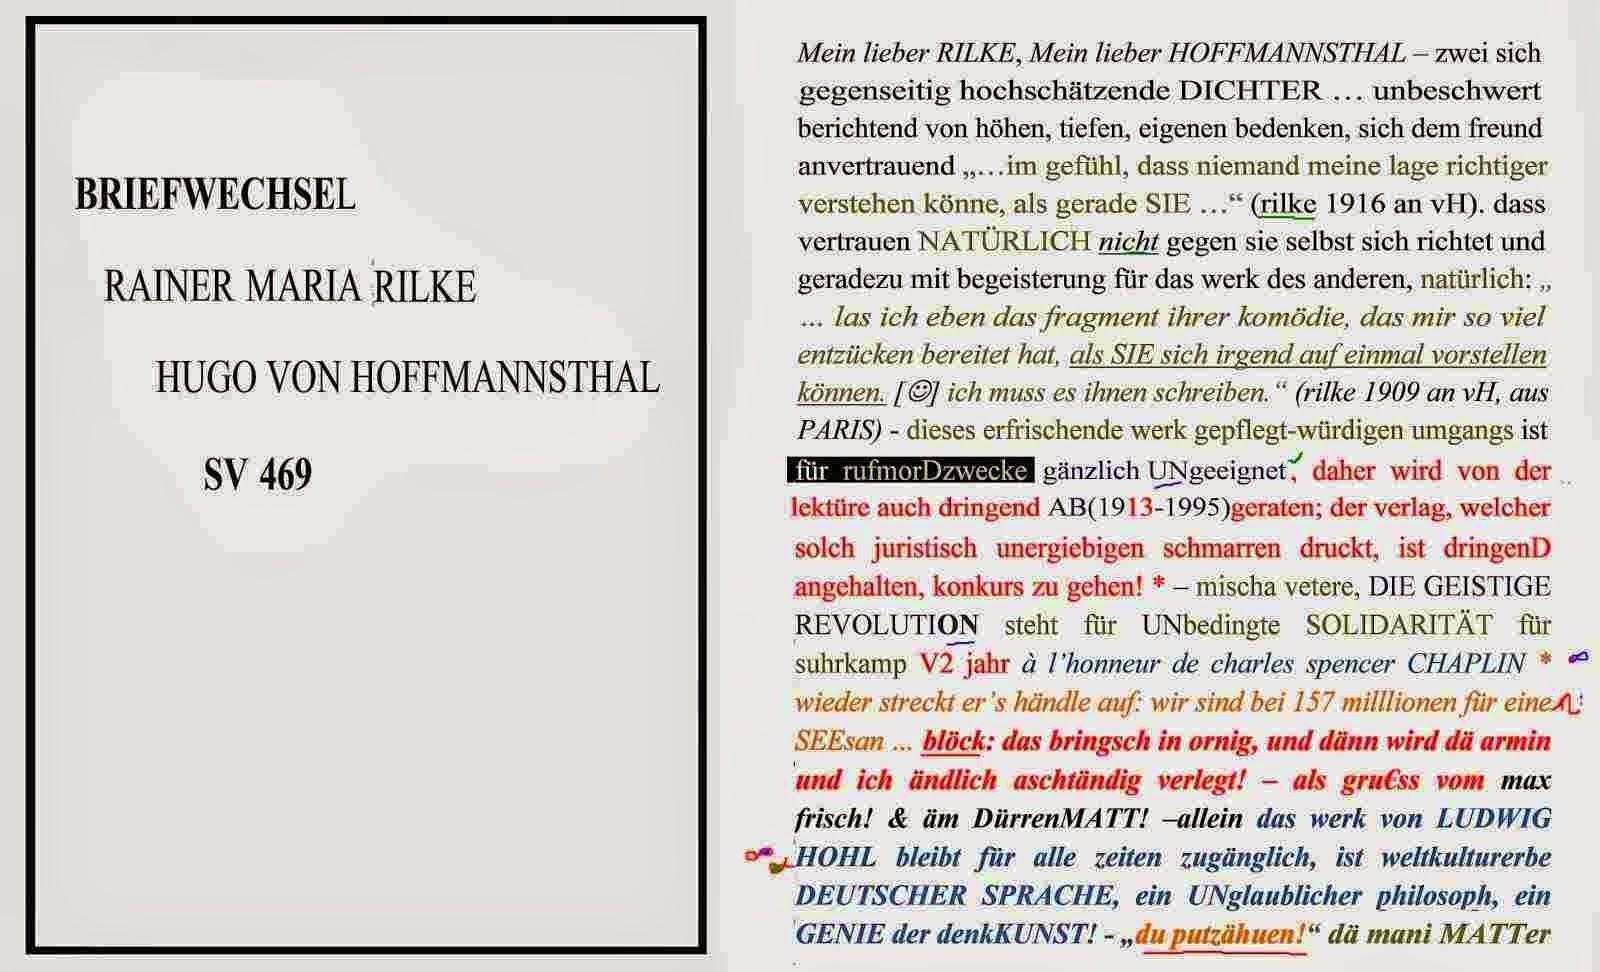 erika burkart mischa vetere beatrice von matt dr. jäger literaturarchiv suhrkamp hommage rilke dgr